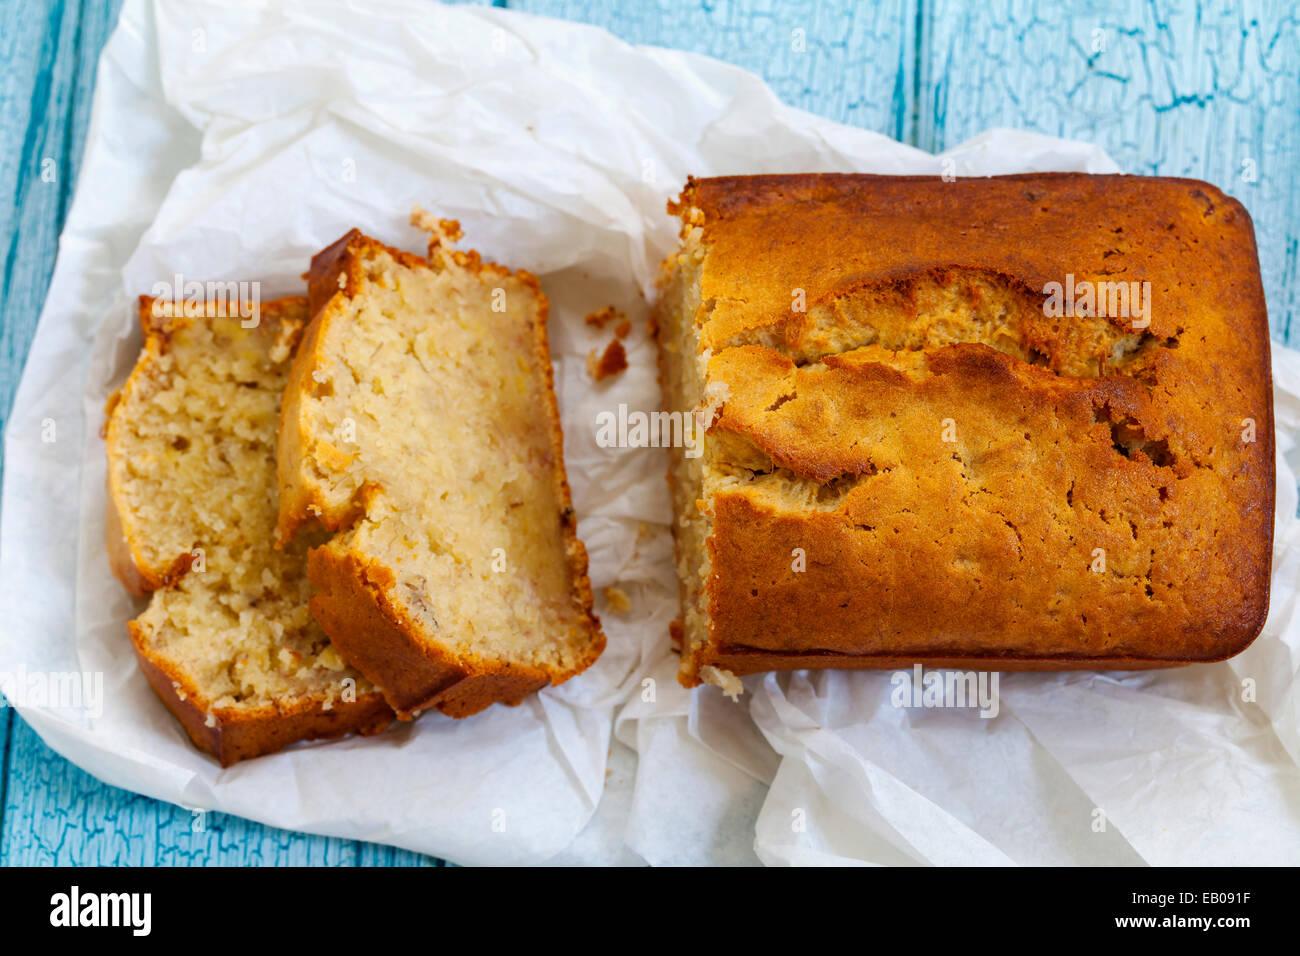 Banana loaf cake - Stock Image